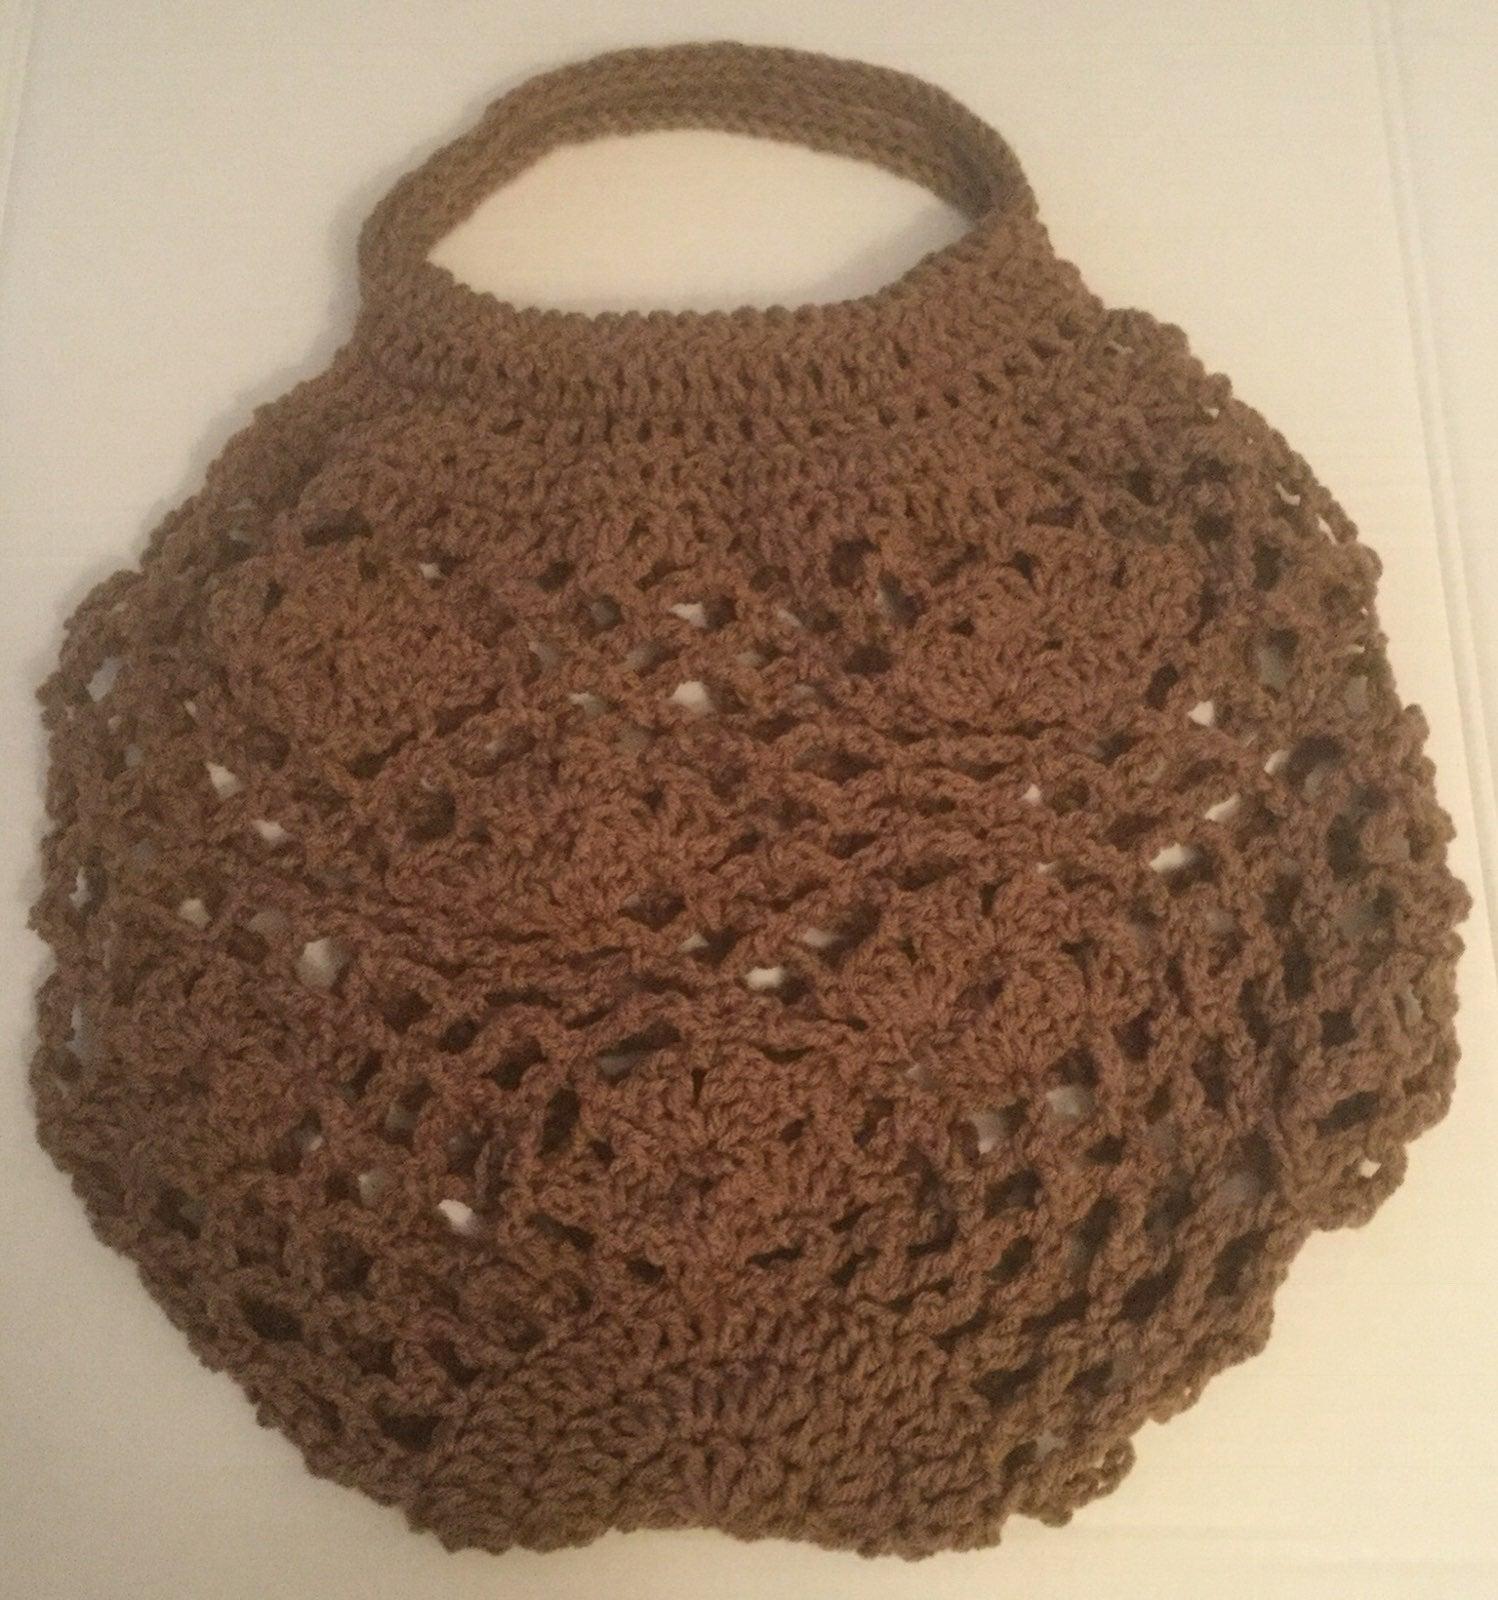 Crocheted open mesh floral shopping bag